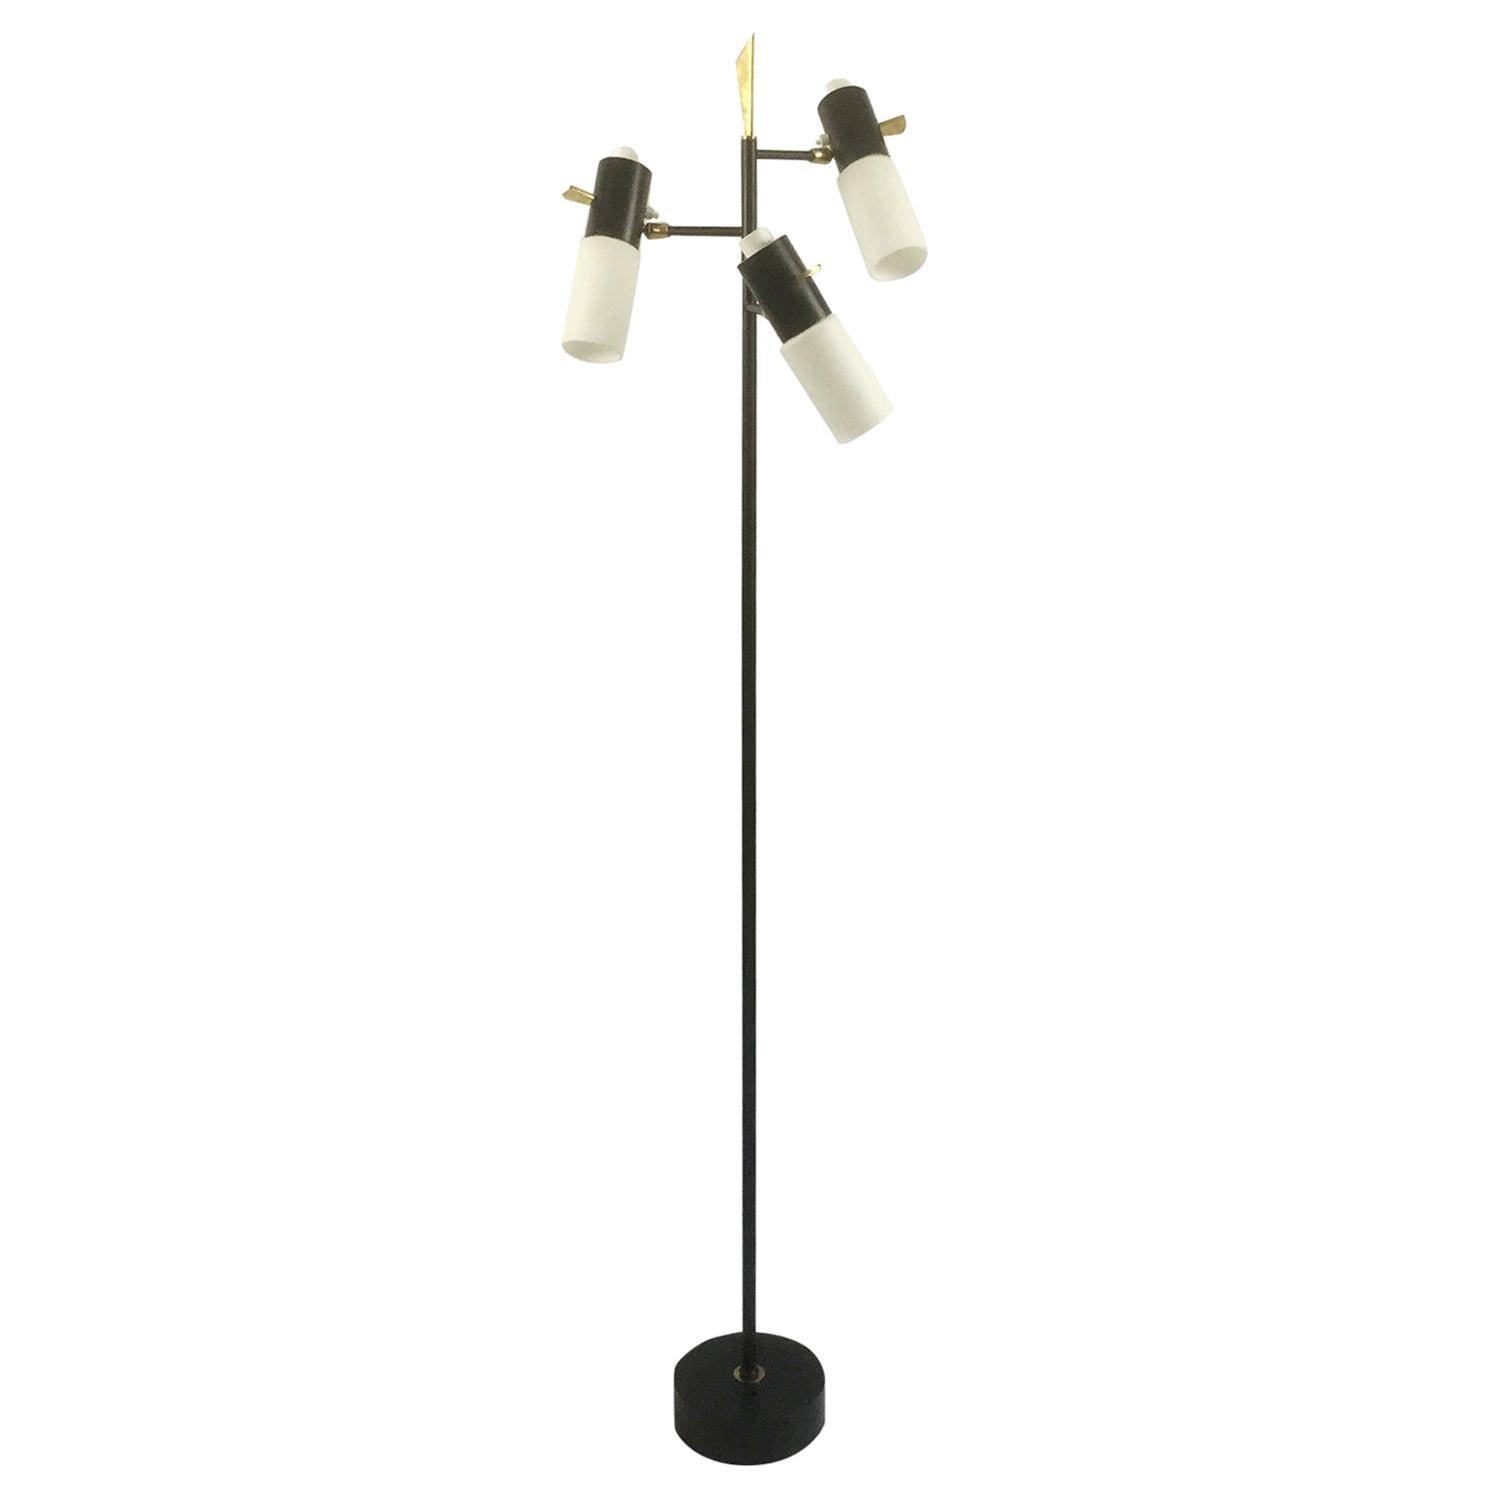 1950s Maison Lunel Floor Lamp Attributed to Jean Boris Lacroix, France